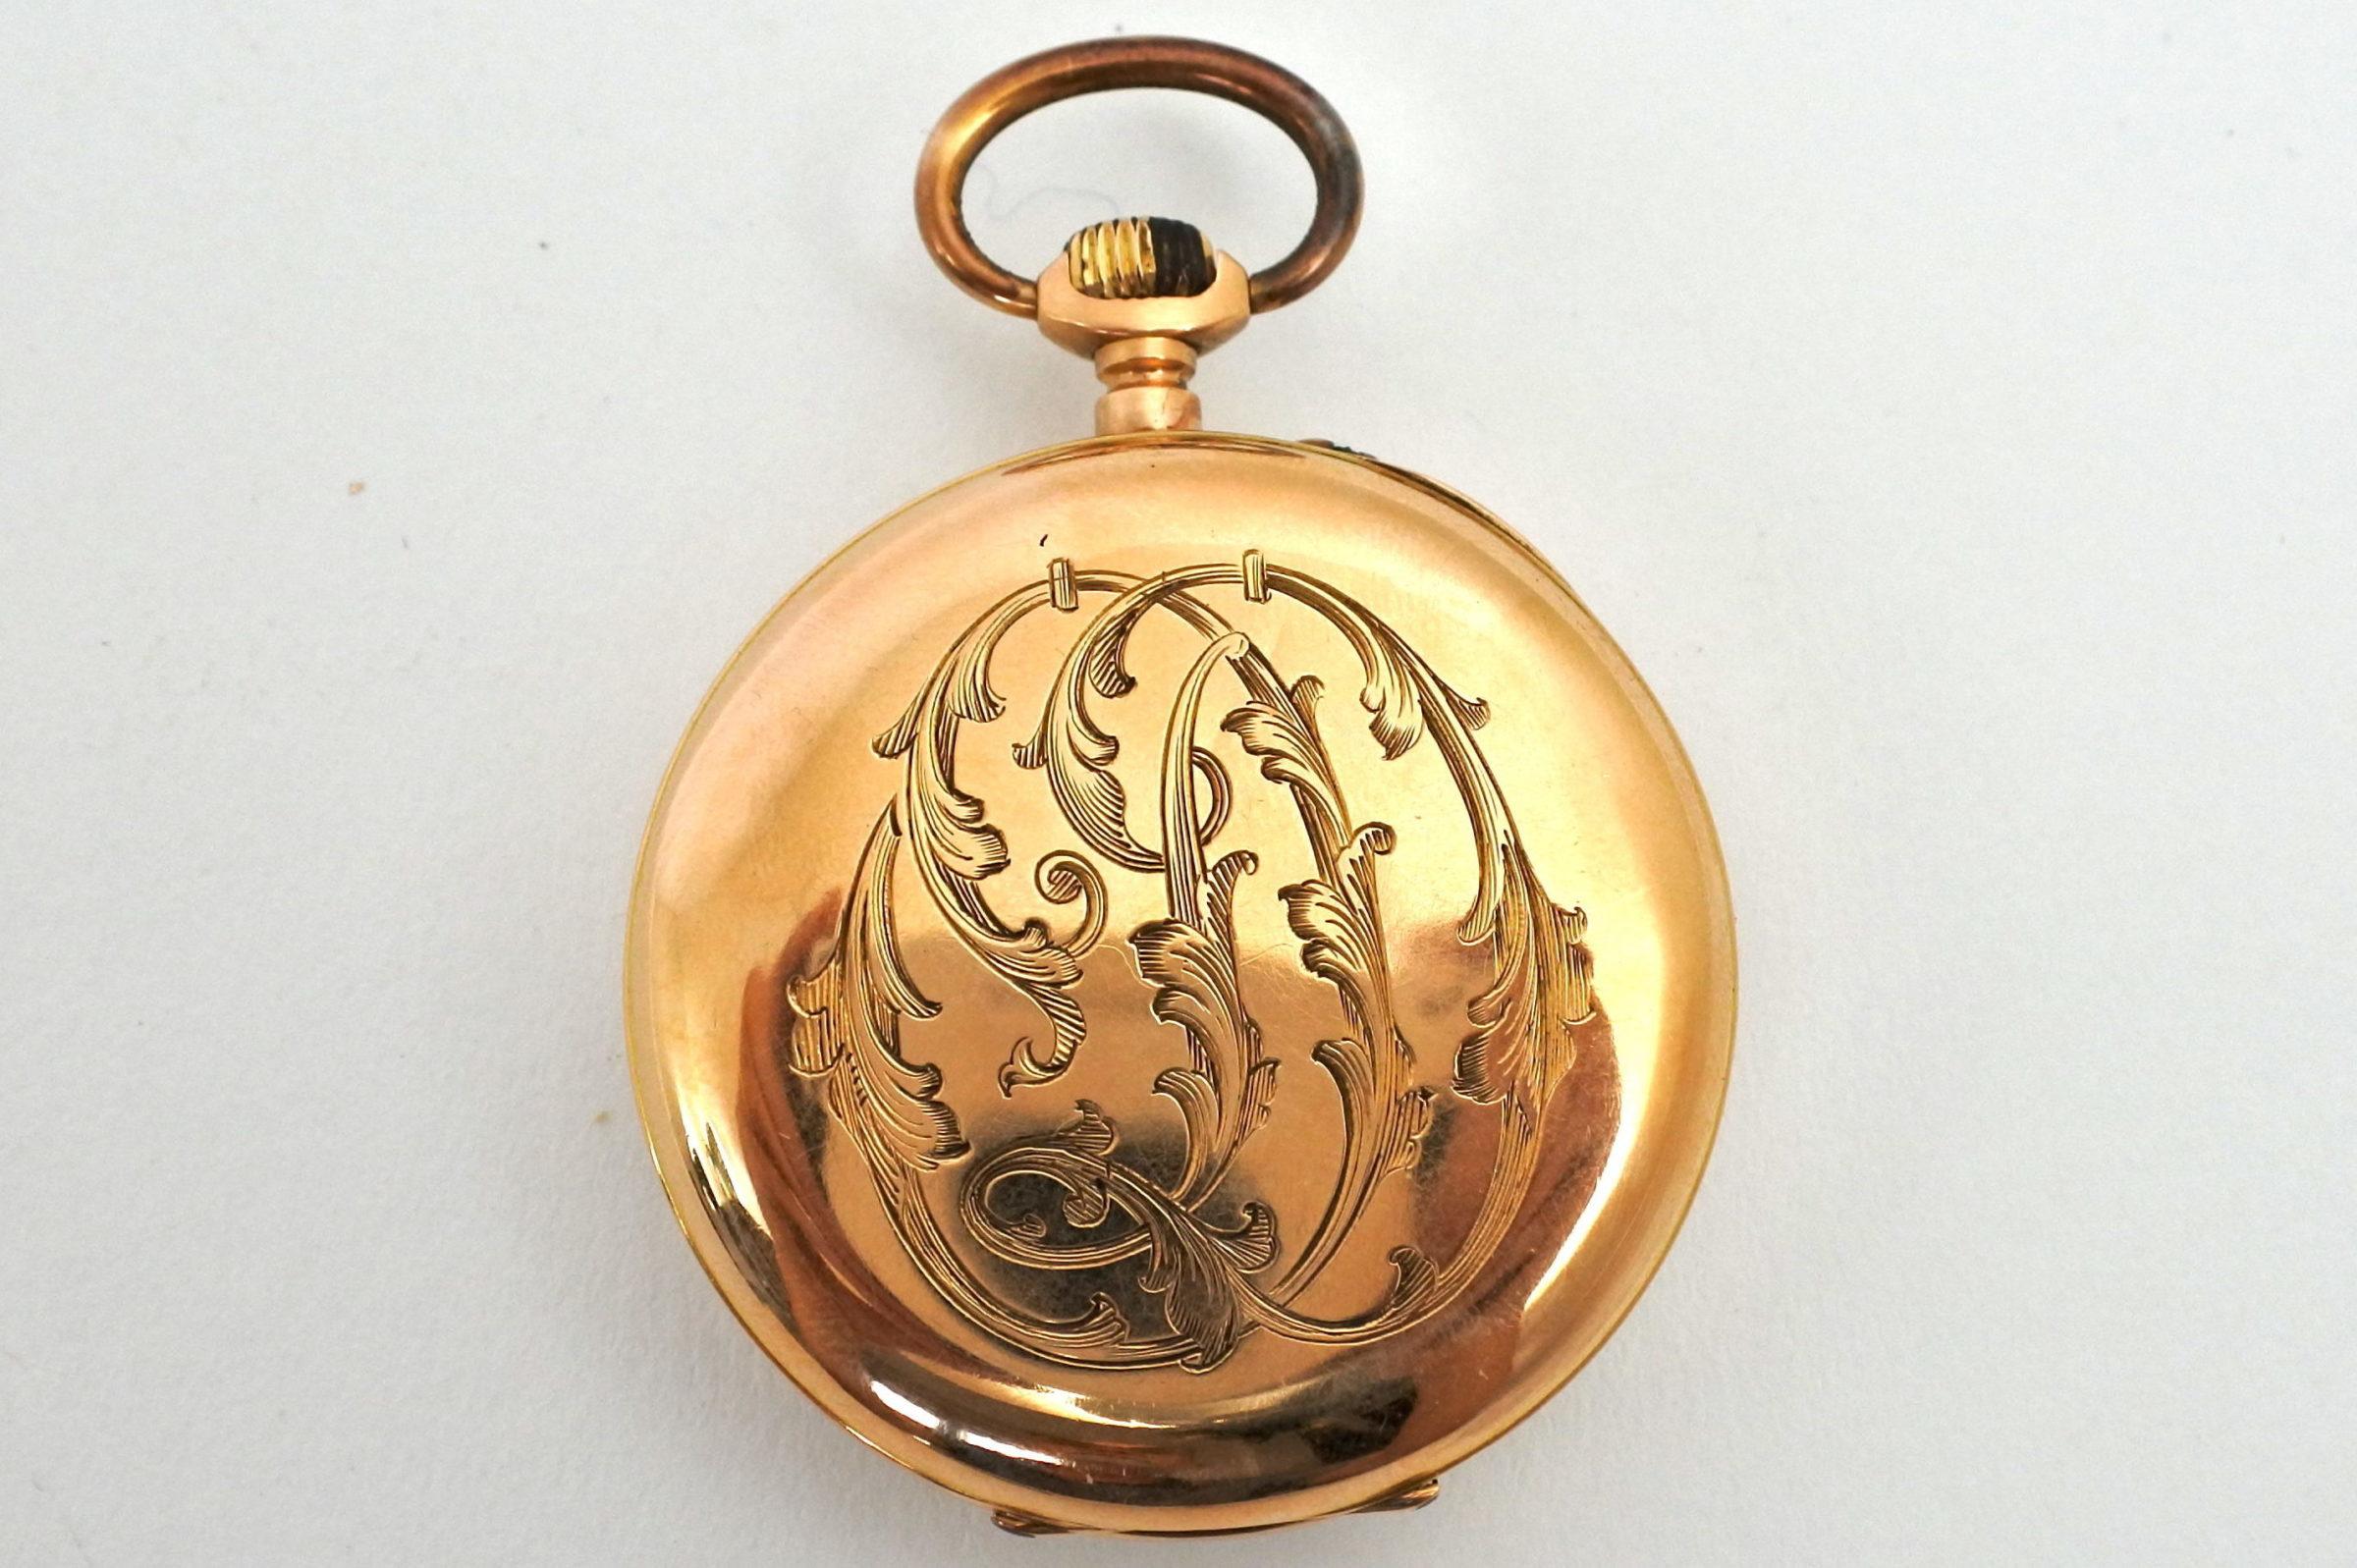 Orologio da tasca in oro - Octave Dupont - 7